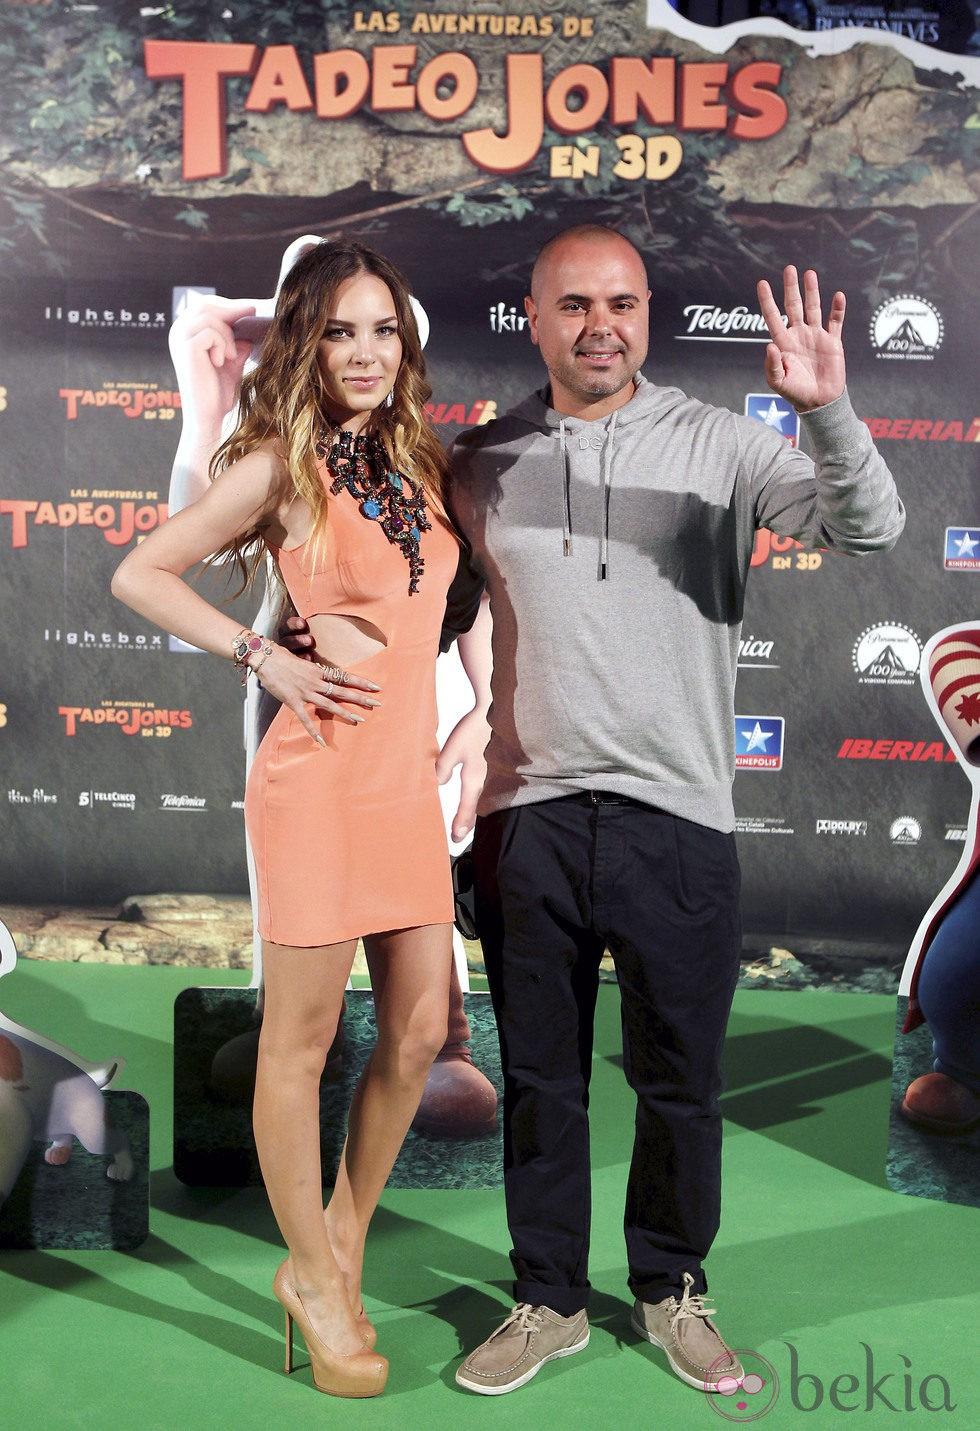 ¿Cuánto mide Juan Magán? 26982_magan-belinda-estreno-aventuras-tadeo